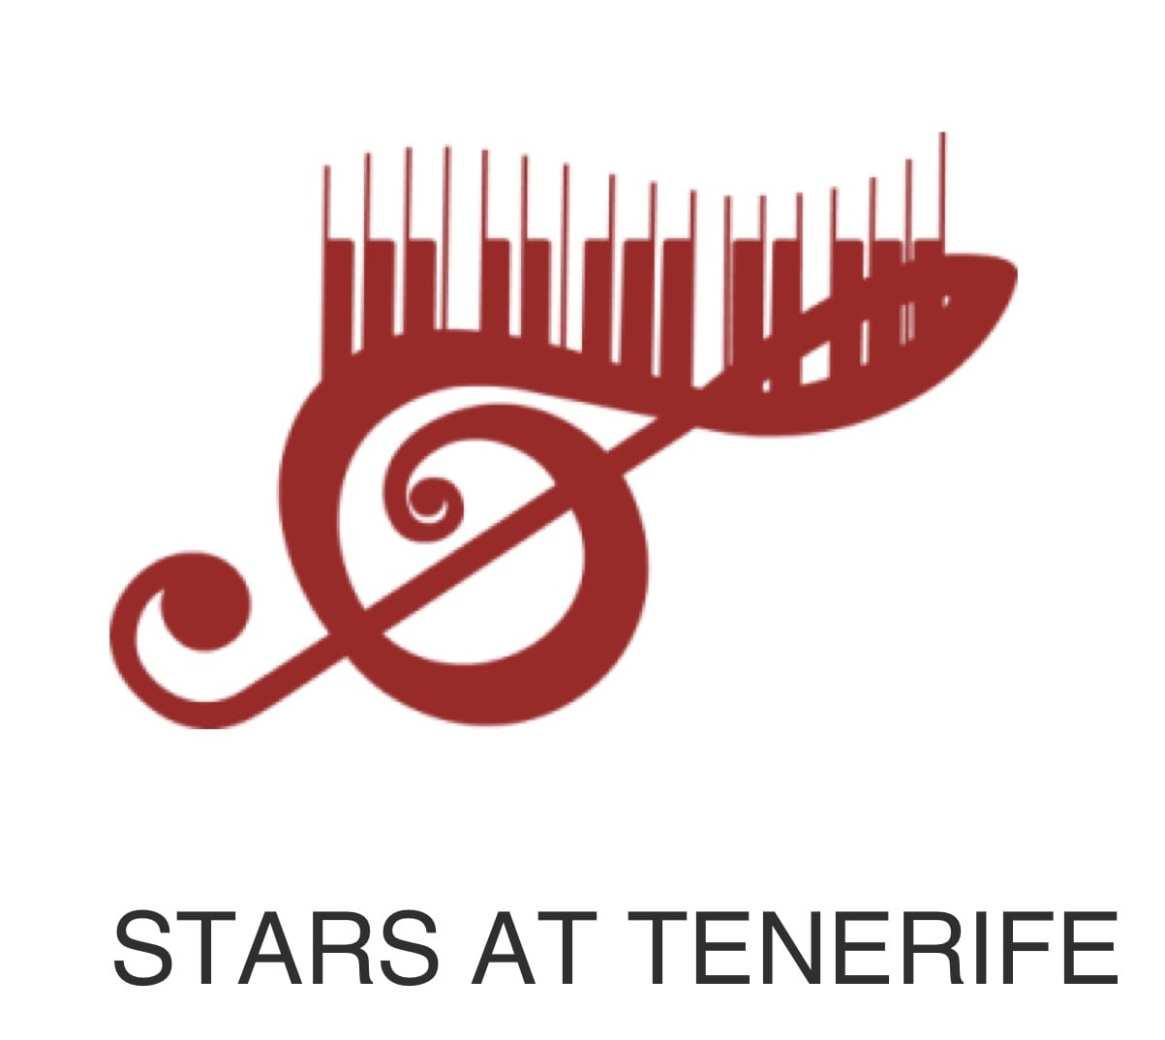 Stars@tenerifelogo